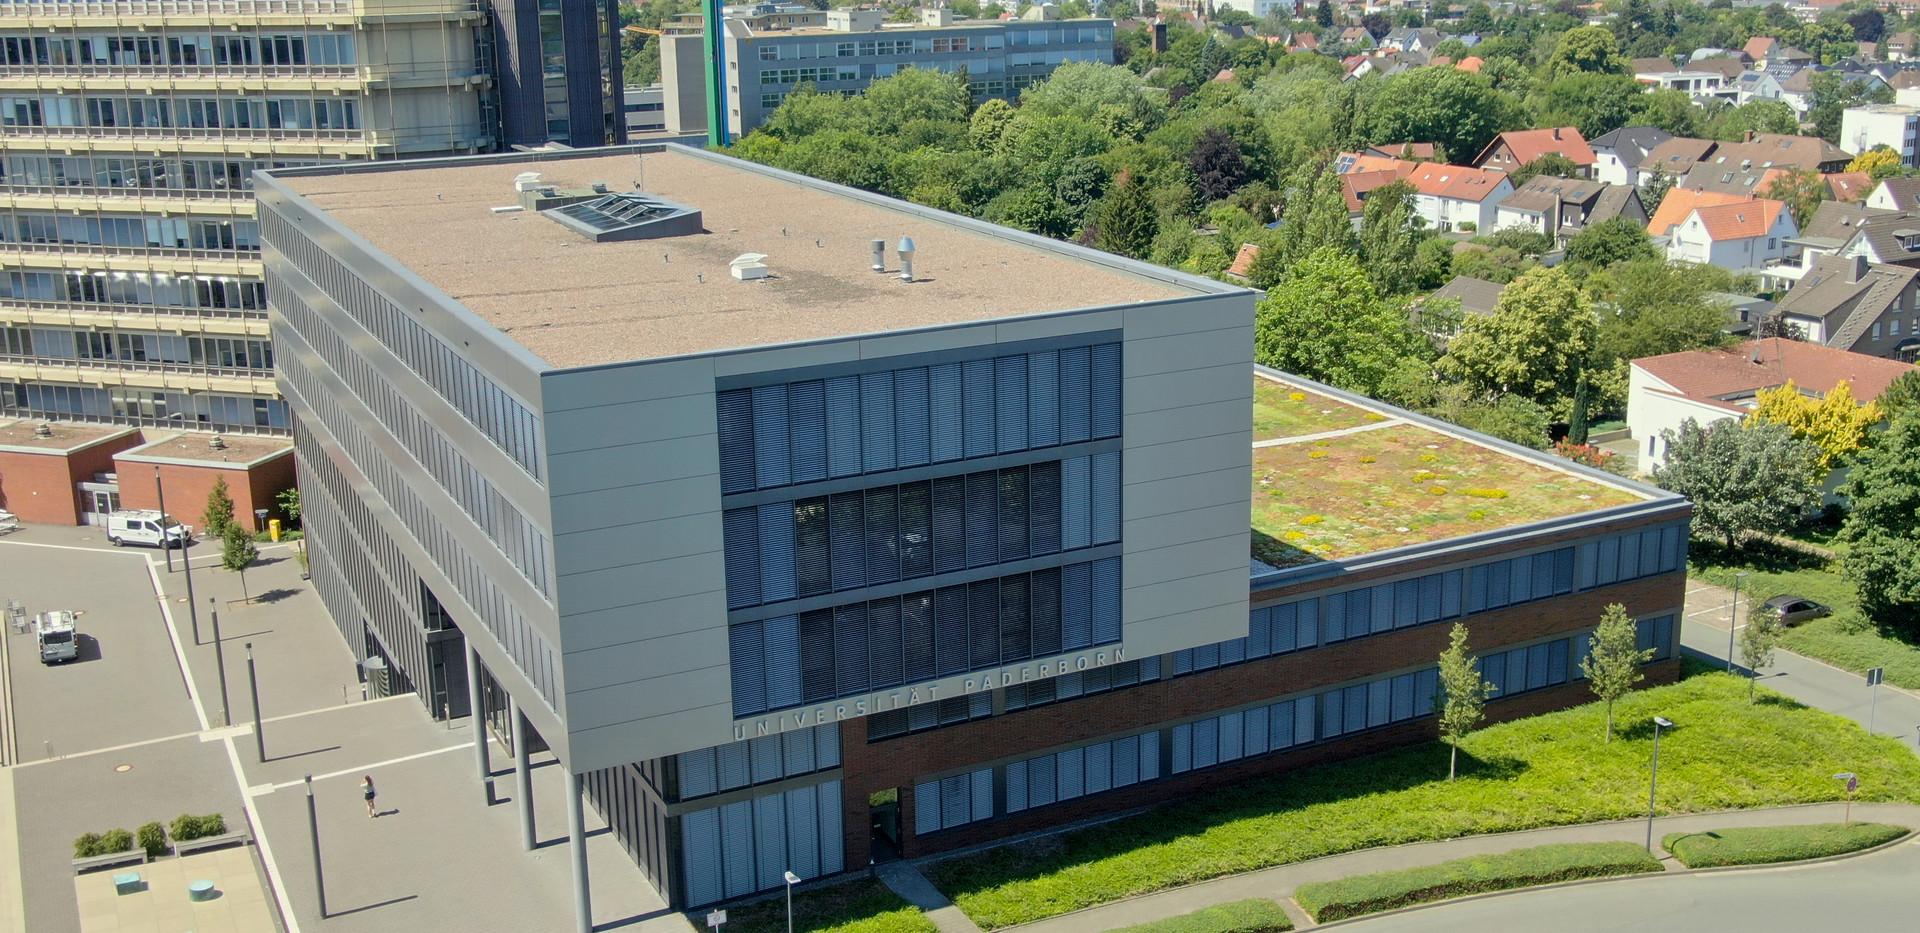 Uni Paderborn